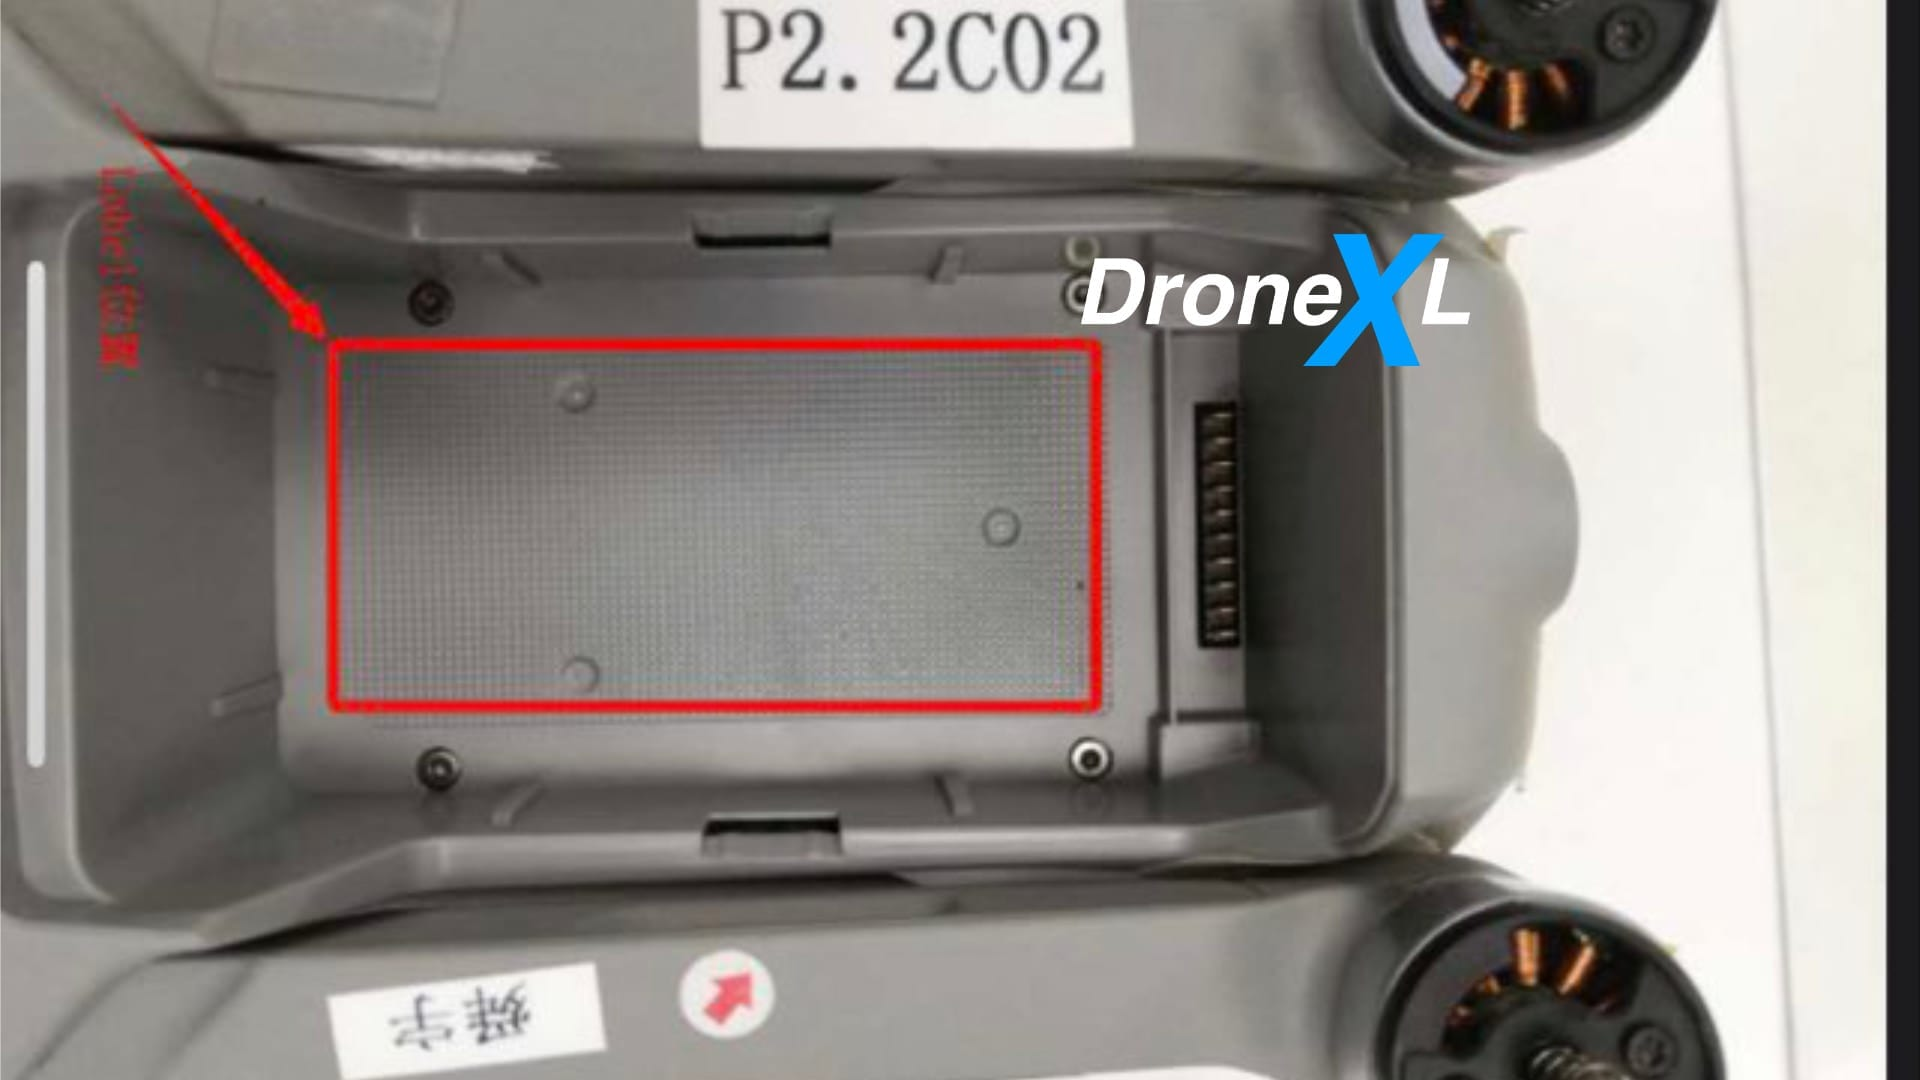 New photos show DJI Mavic Air 2 has no top obstacle avoidance sensors